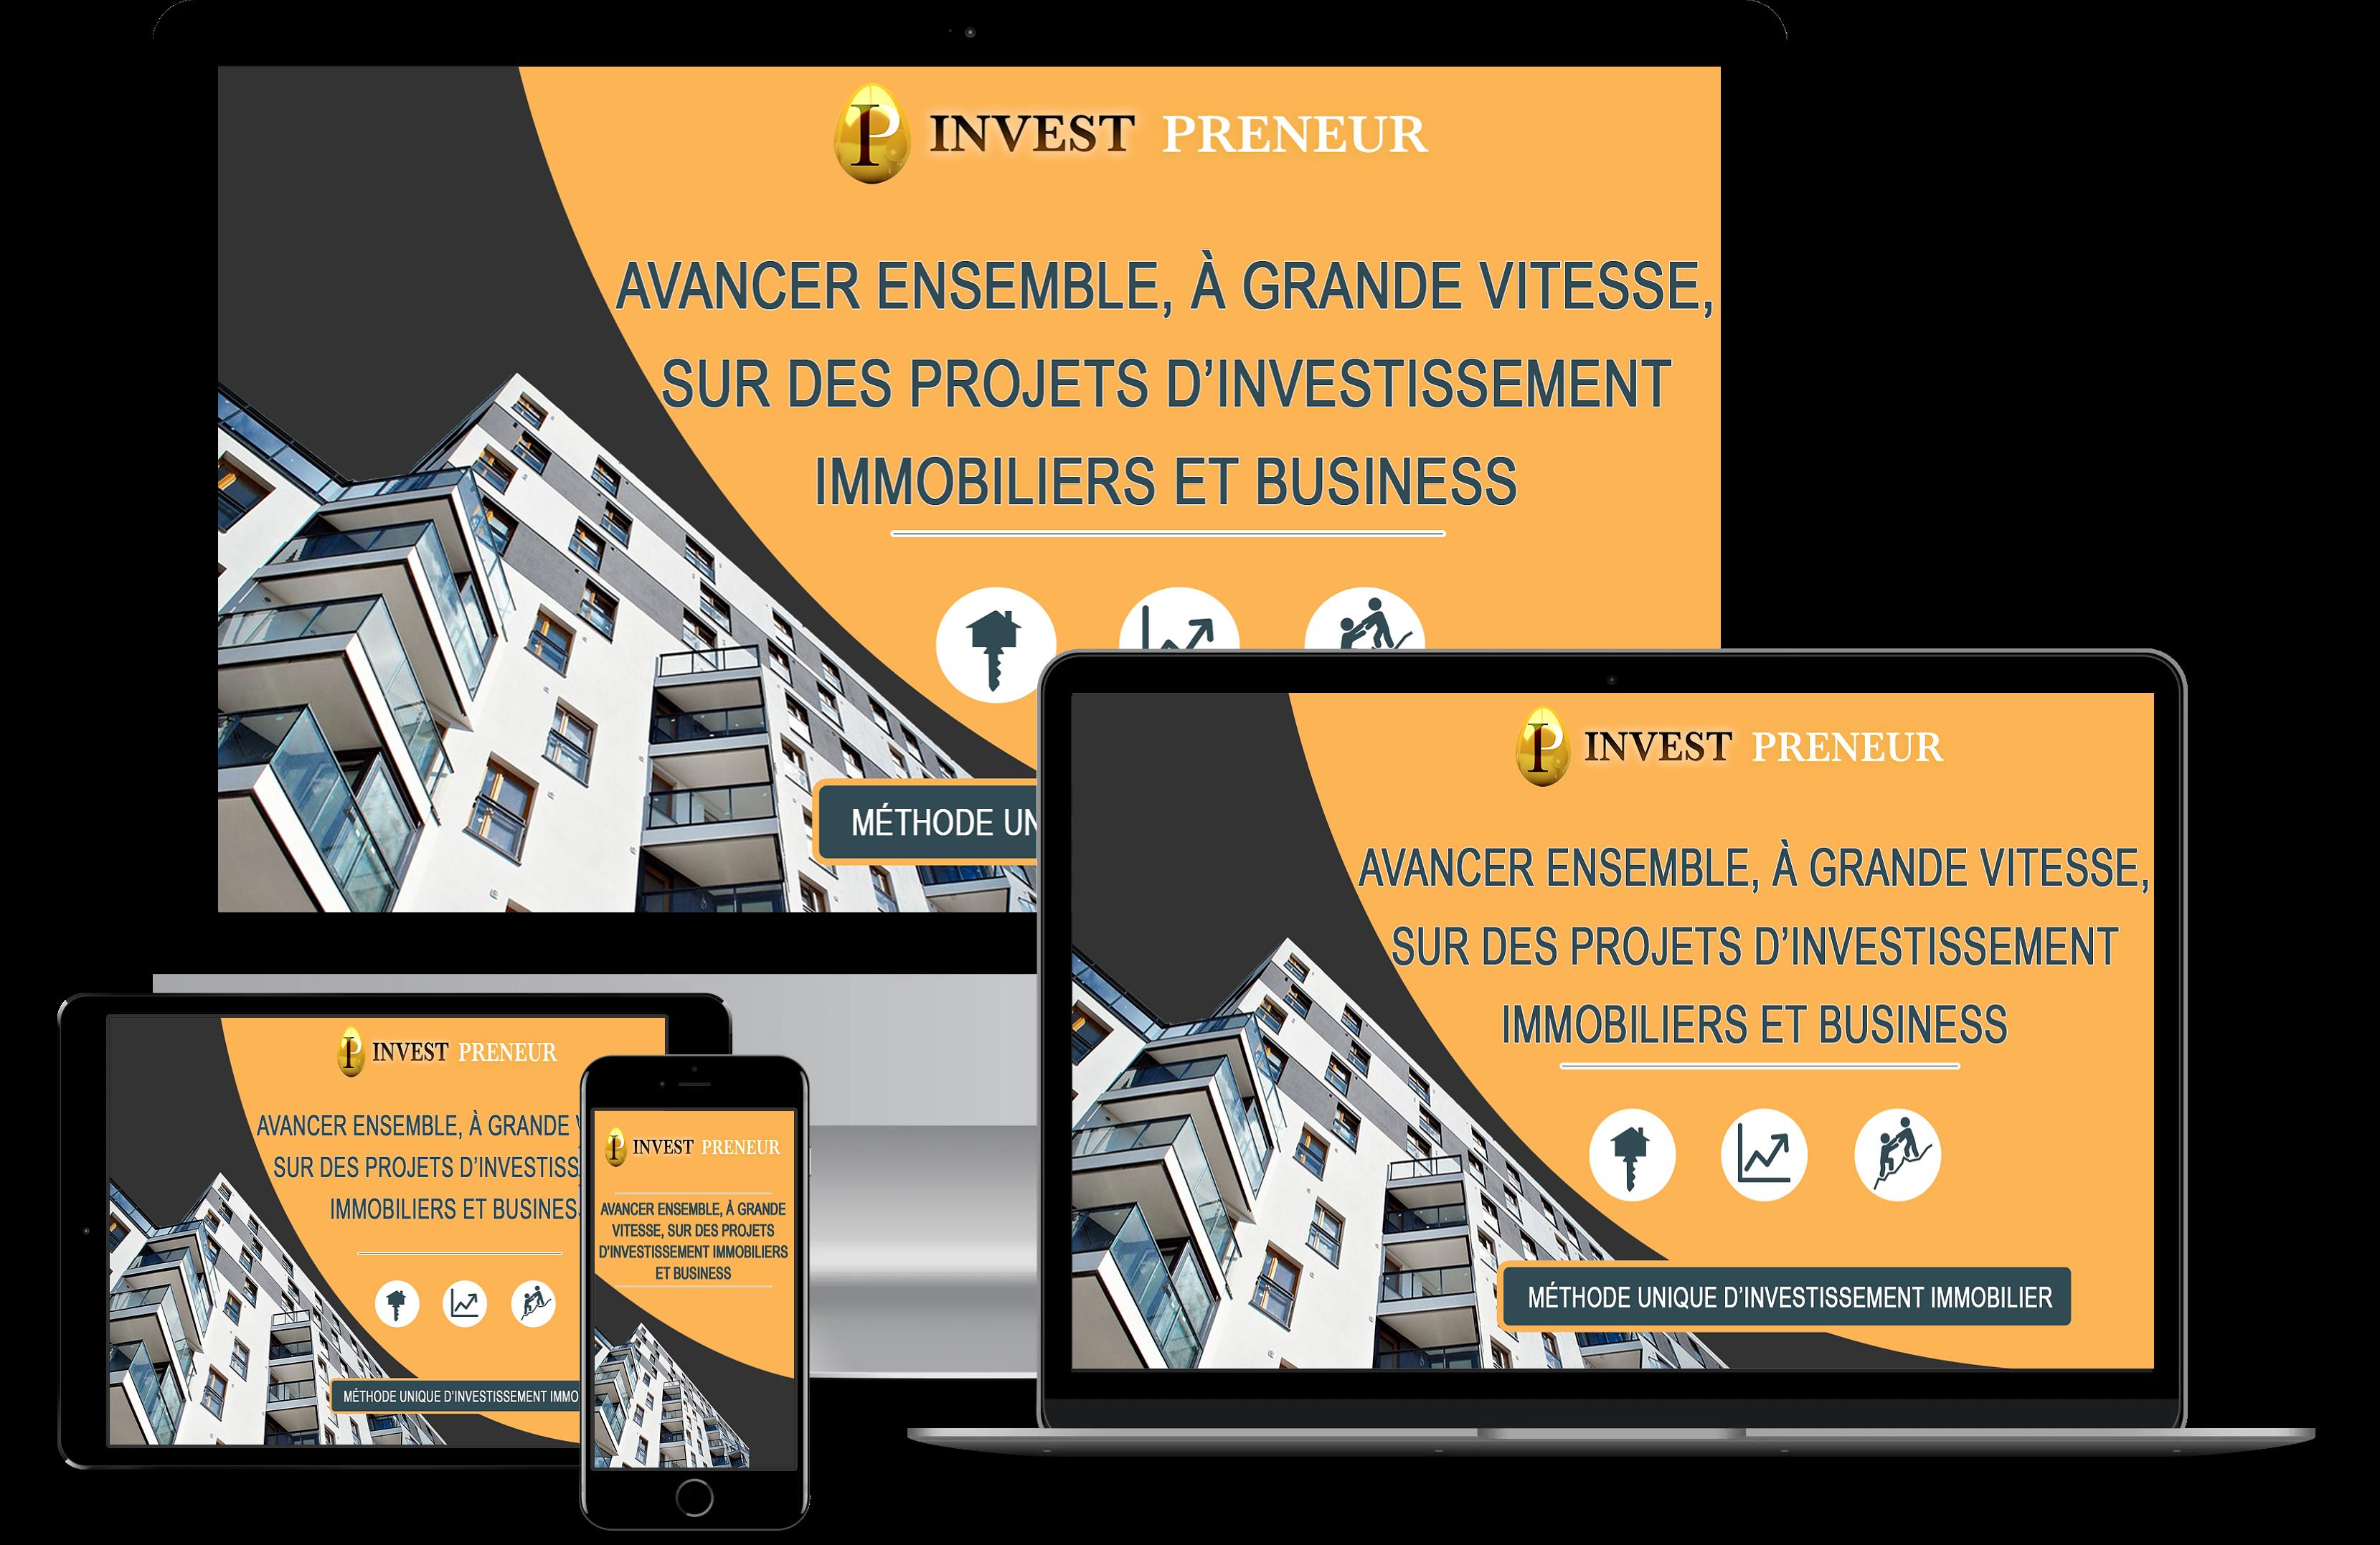 smartmockups khn87myf - Immobilier Rentable et Indépendance Financière